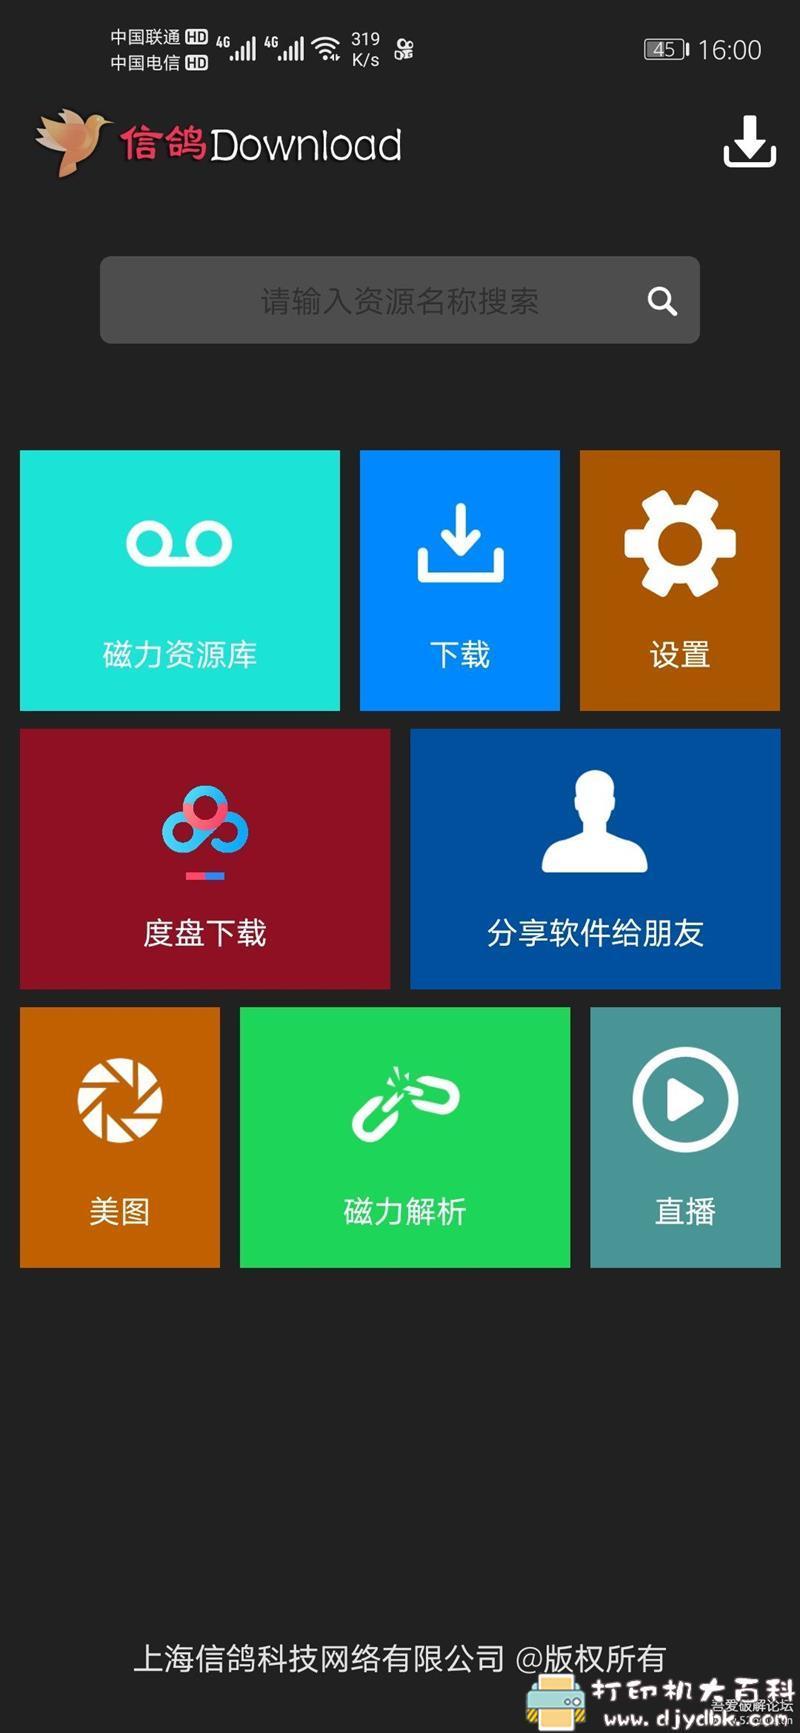 [Android]信鸽下载器v6.4,一款安卓下载工具,多线程下载模式 配图 No.1